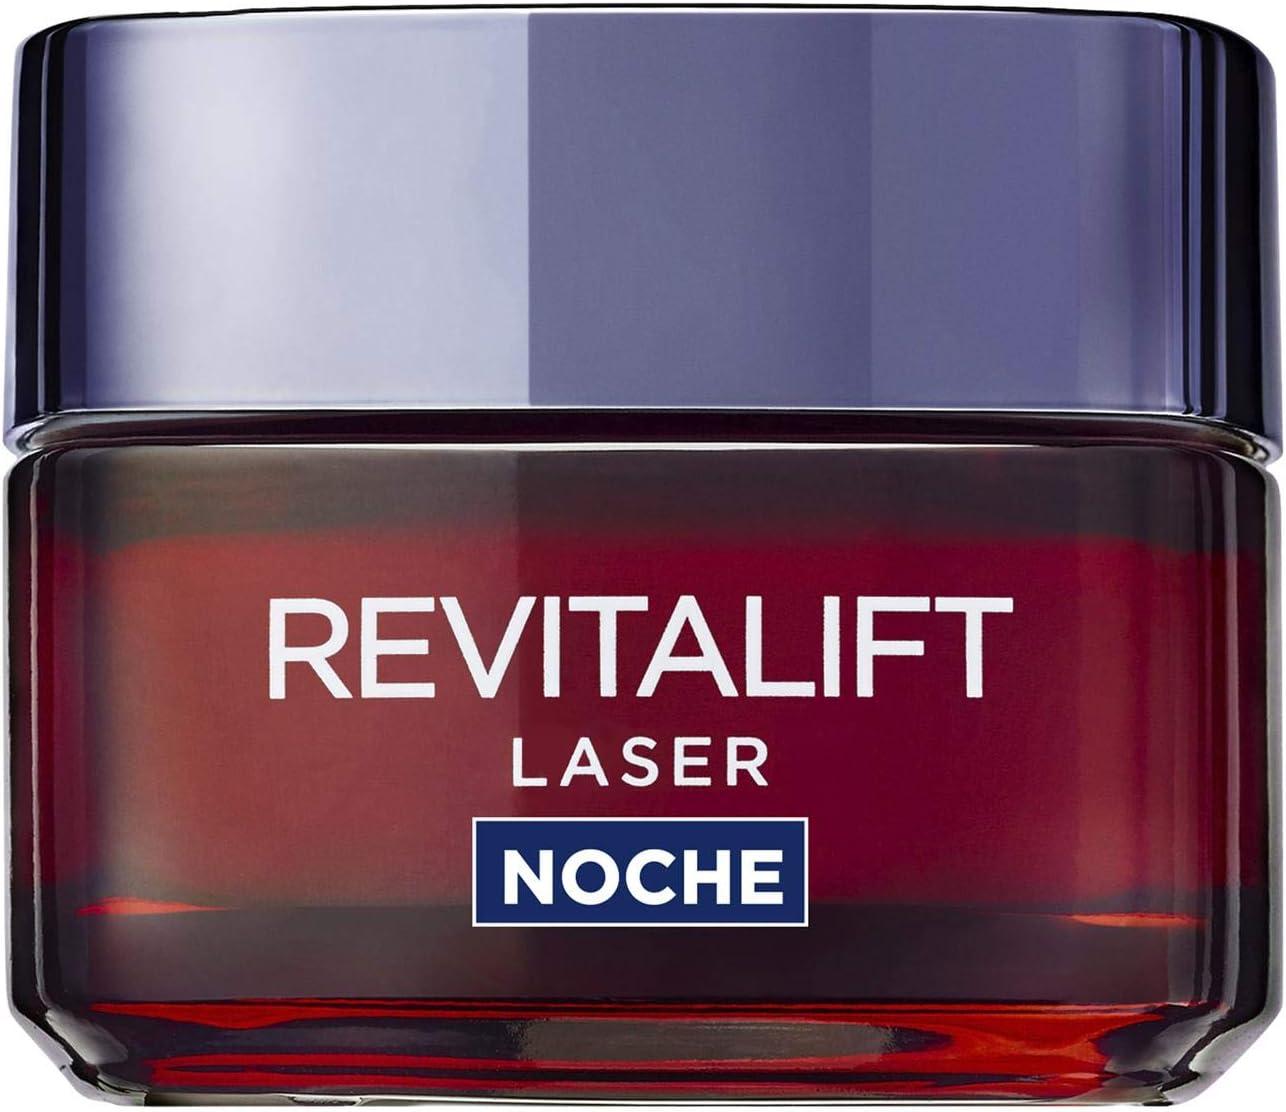 L'Oreal Paris Revitalift Laser Crema de Noche Anti-Edad con efecto mascarilla, Proxylane - 50 ml